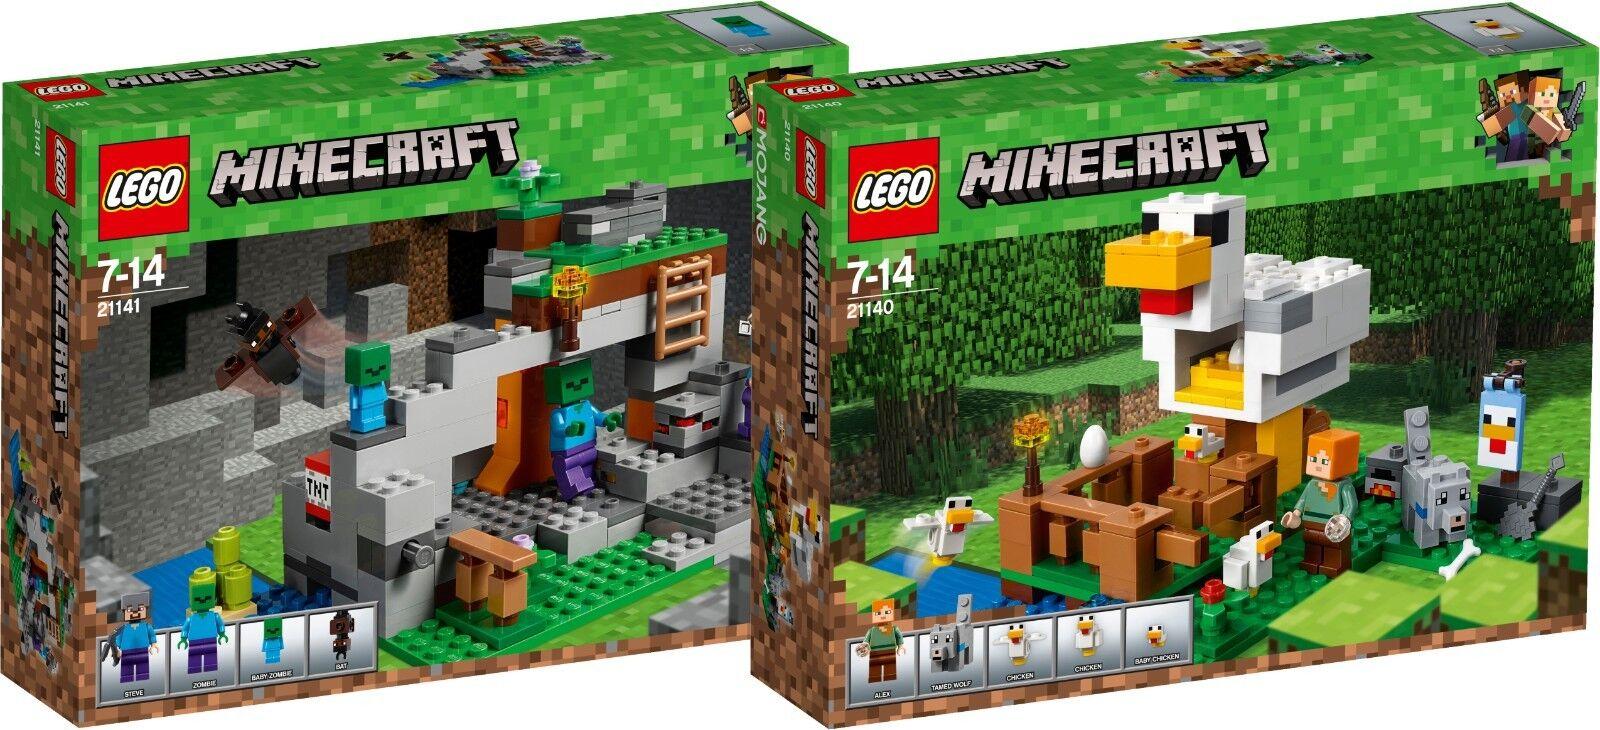 LEGO Minecraft Zombiehöhle 21141 + 21140 Hühnerstall N1 18